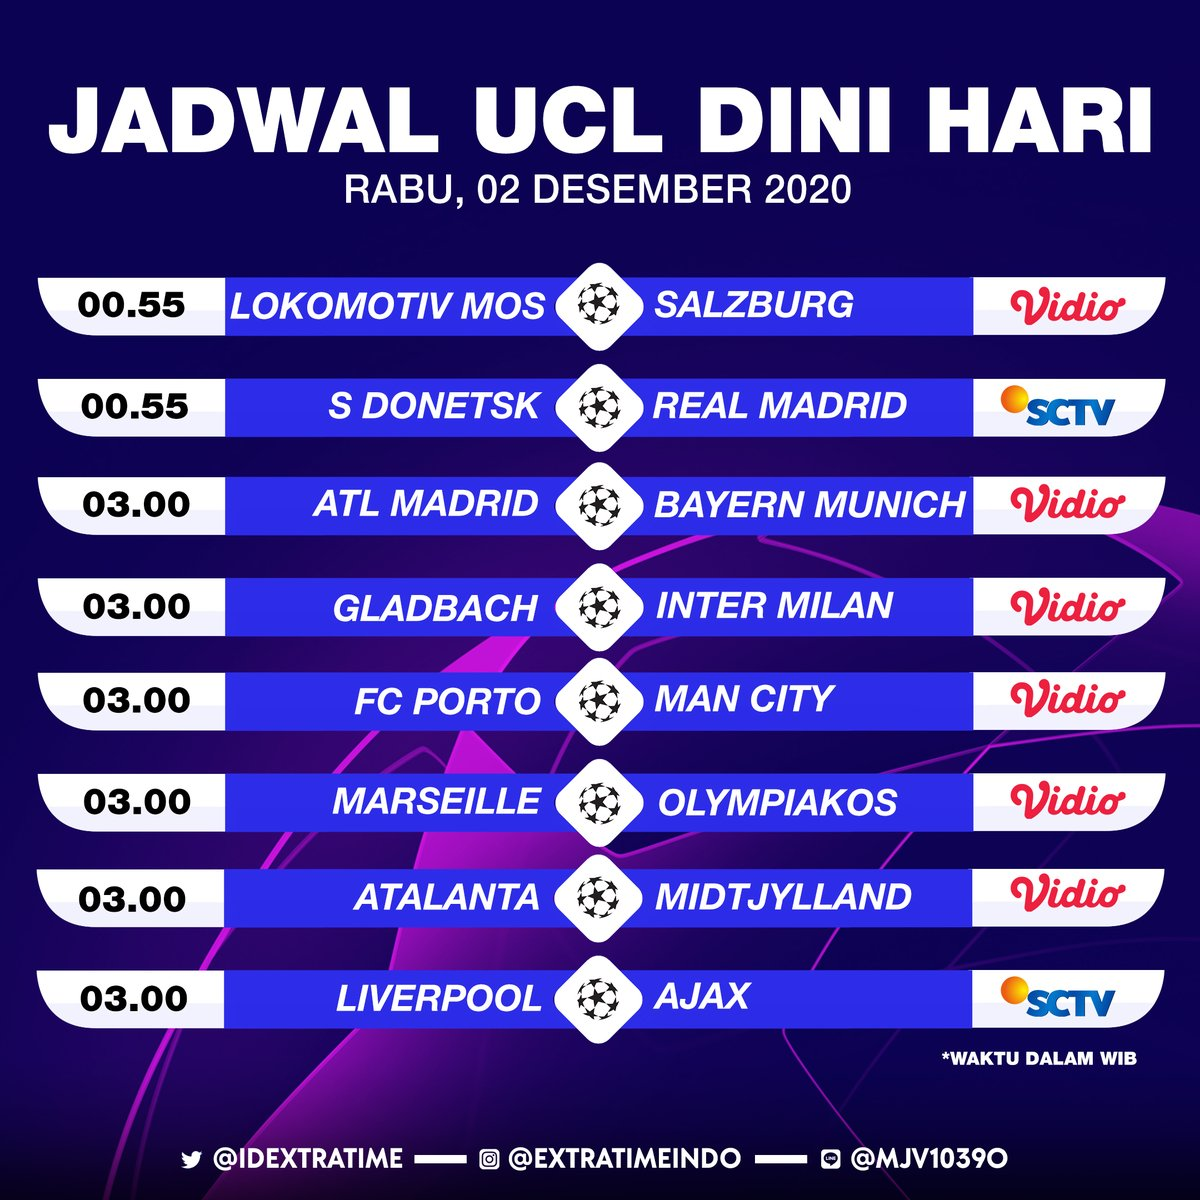 Extra Time Indonesia On Twitter Jadwal Liga Champions Tengah Pekan Ini Rabu 2 Desember 2020 00 55 Wib Shakhtar Donetsk Vs Real Madrid 03 00 Wib Liverpool Vs Ajax Amsterdam Live